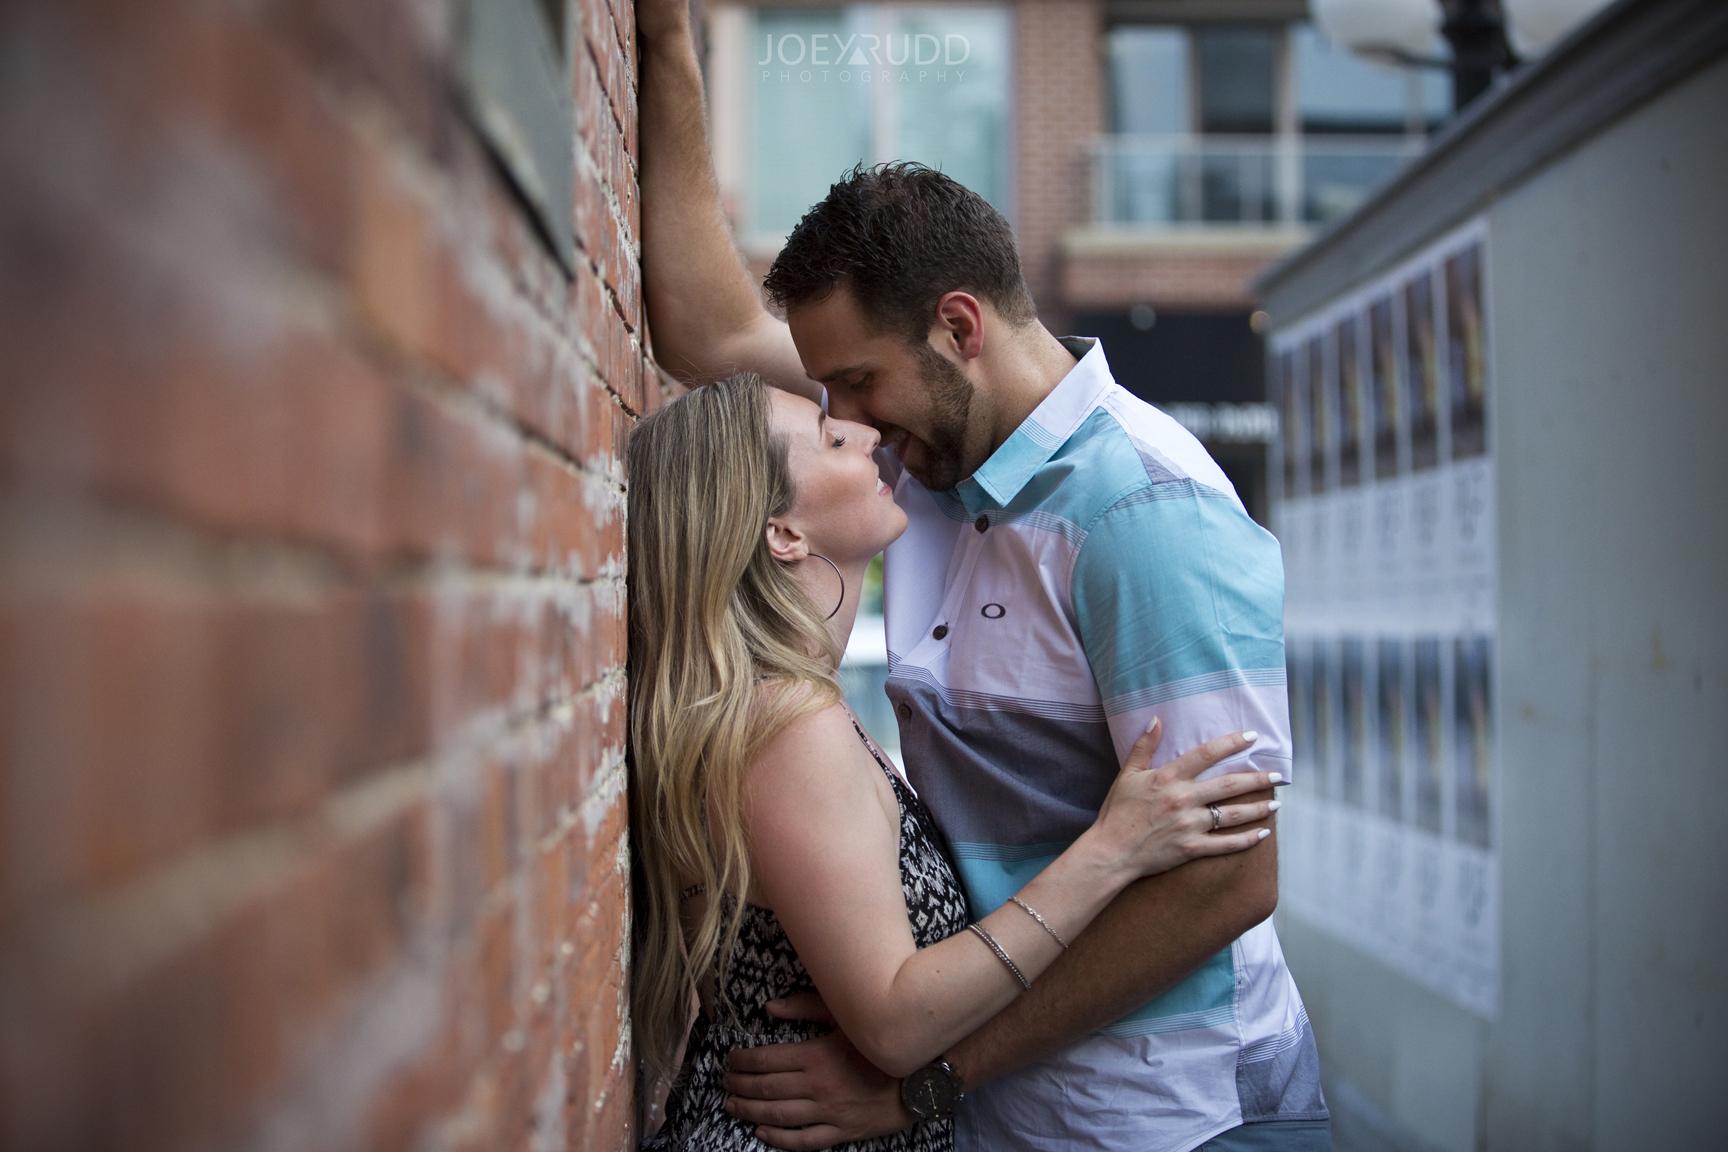 Joey Rudd Photography Ottawa Wedding Photographer Engagement Downtown Kissing Photo